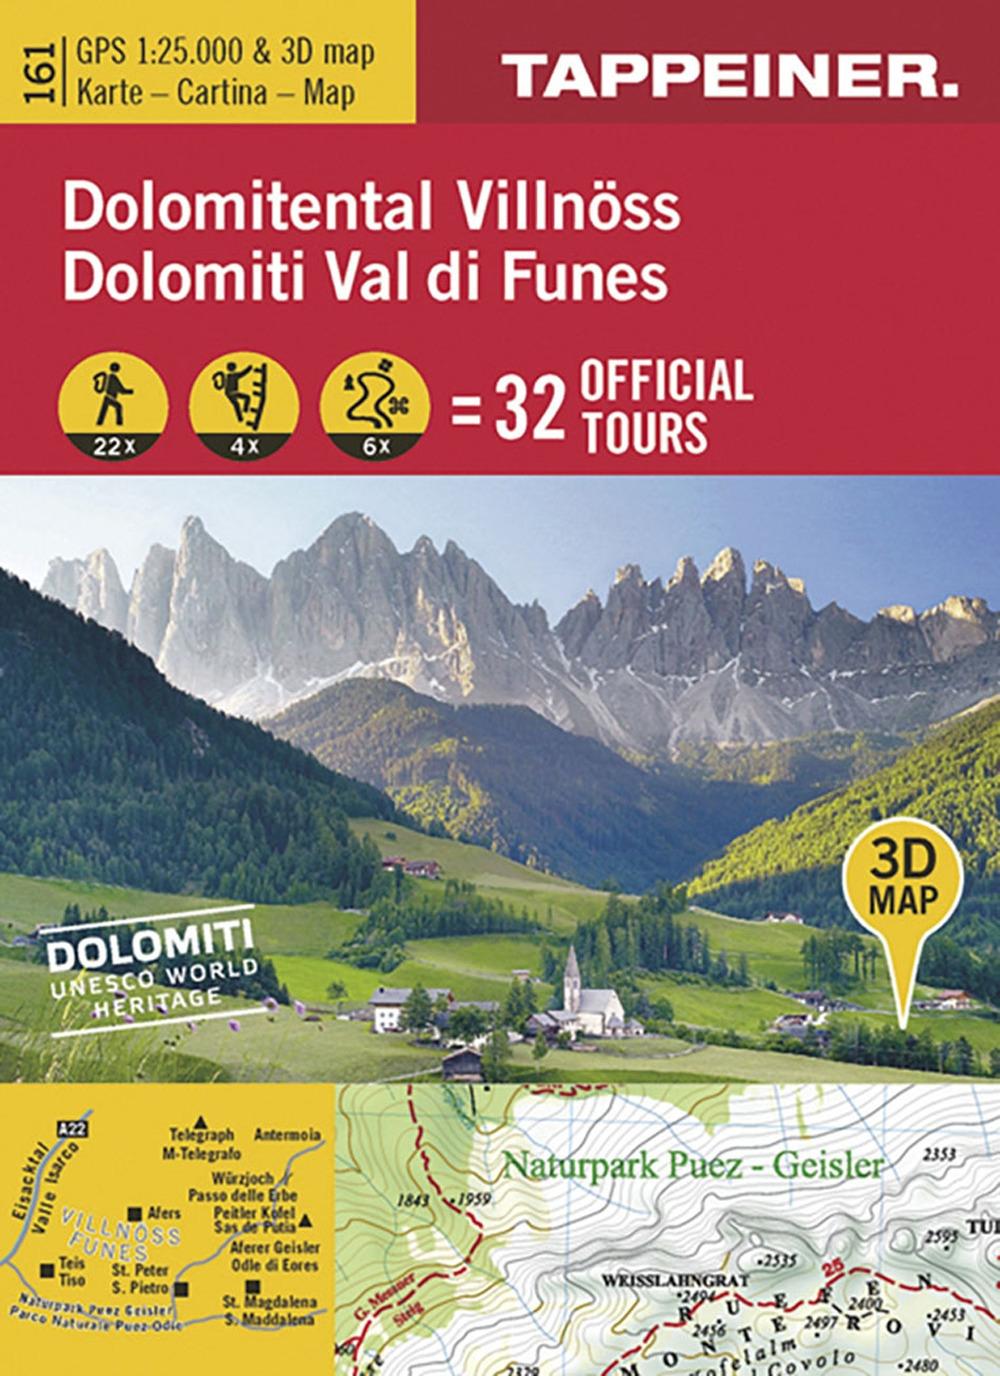 Dolomiti Val di Funes. Cartina topografica. Carta panoramica 3D.